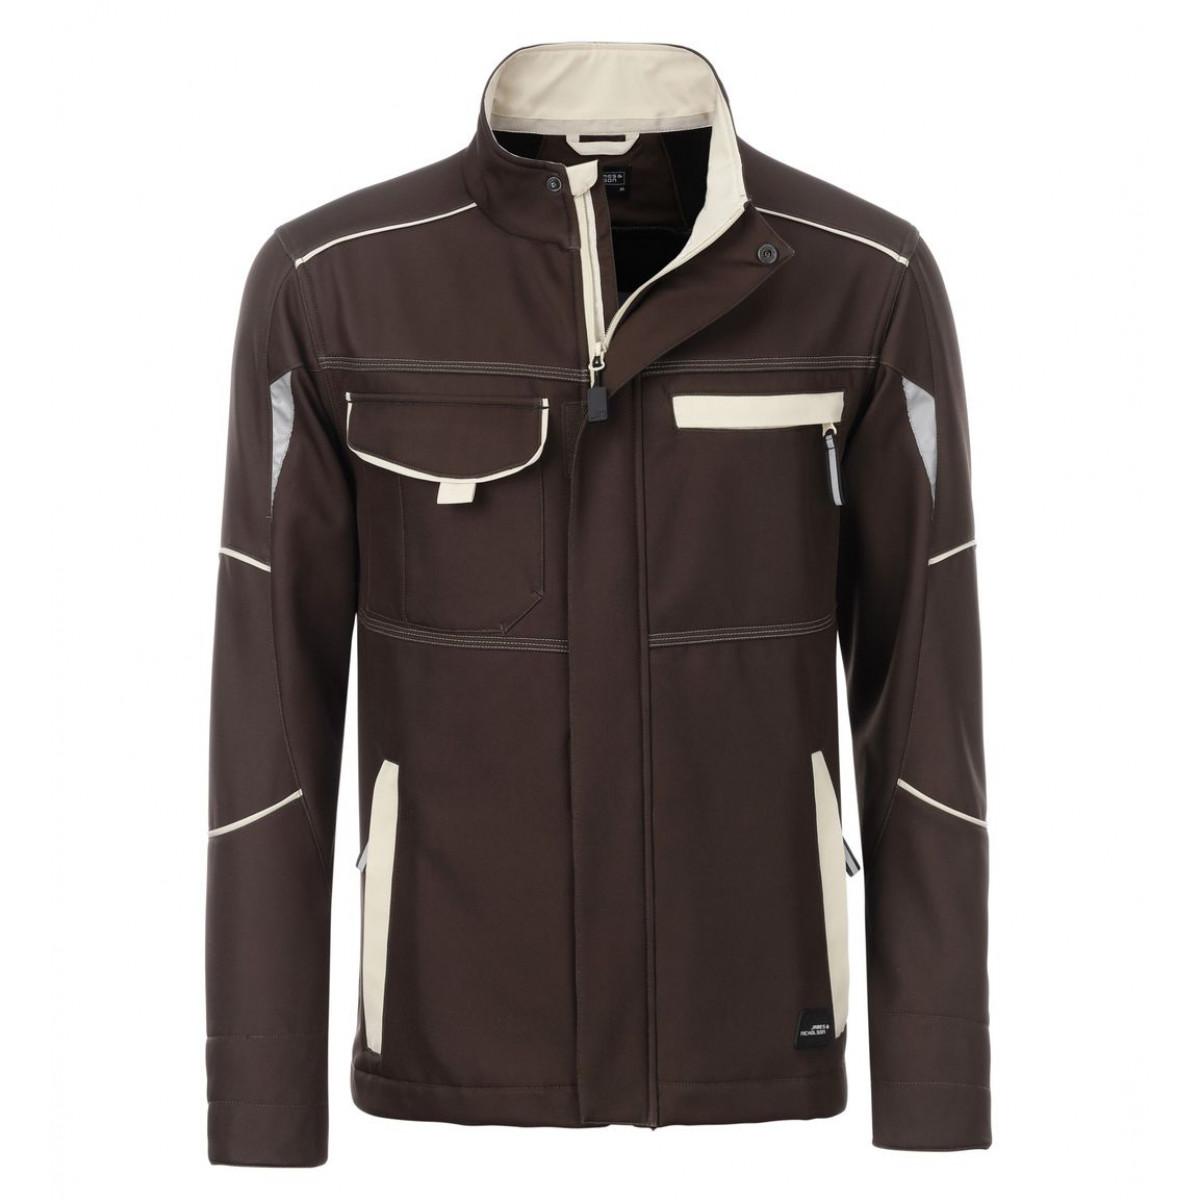 Куртка мужская JN851 Workwear Softshell Jacket-Level 2 - Коричневый/Бежевый